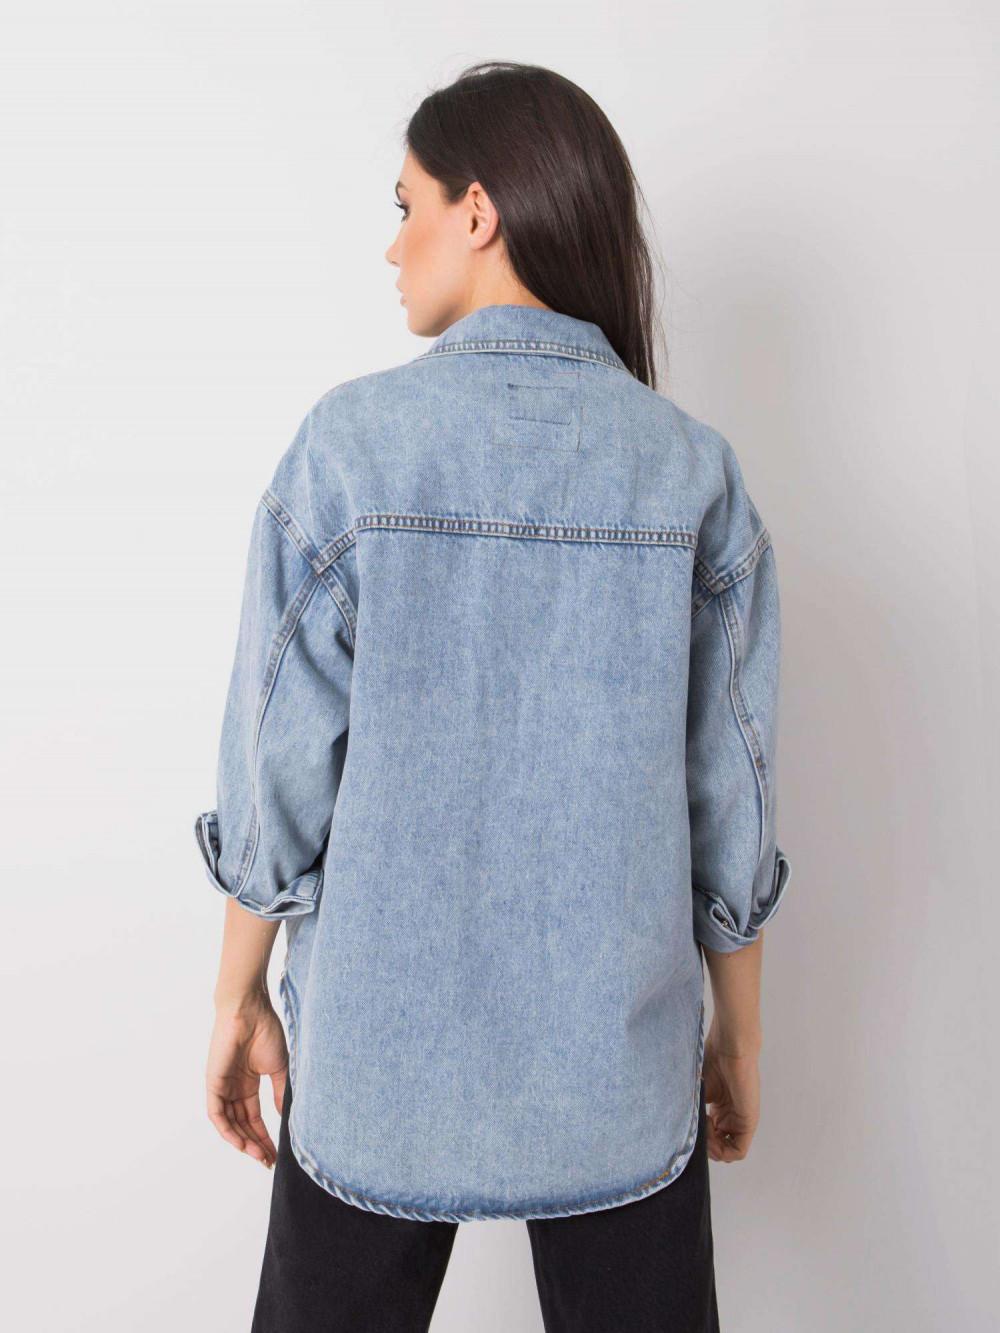 Jasnoniebieski kurtka jeansowa oversize Kharis 4